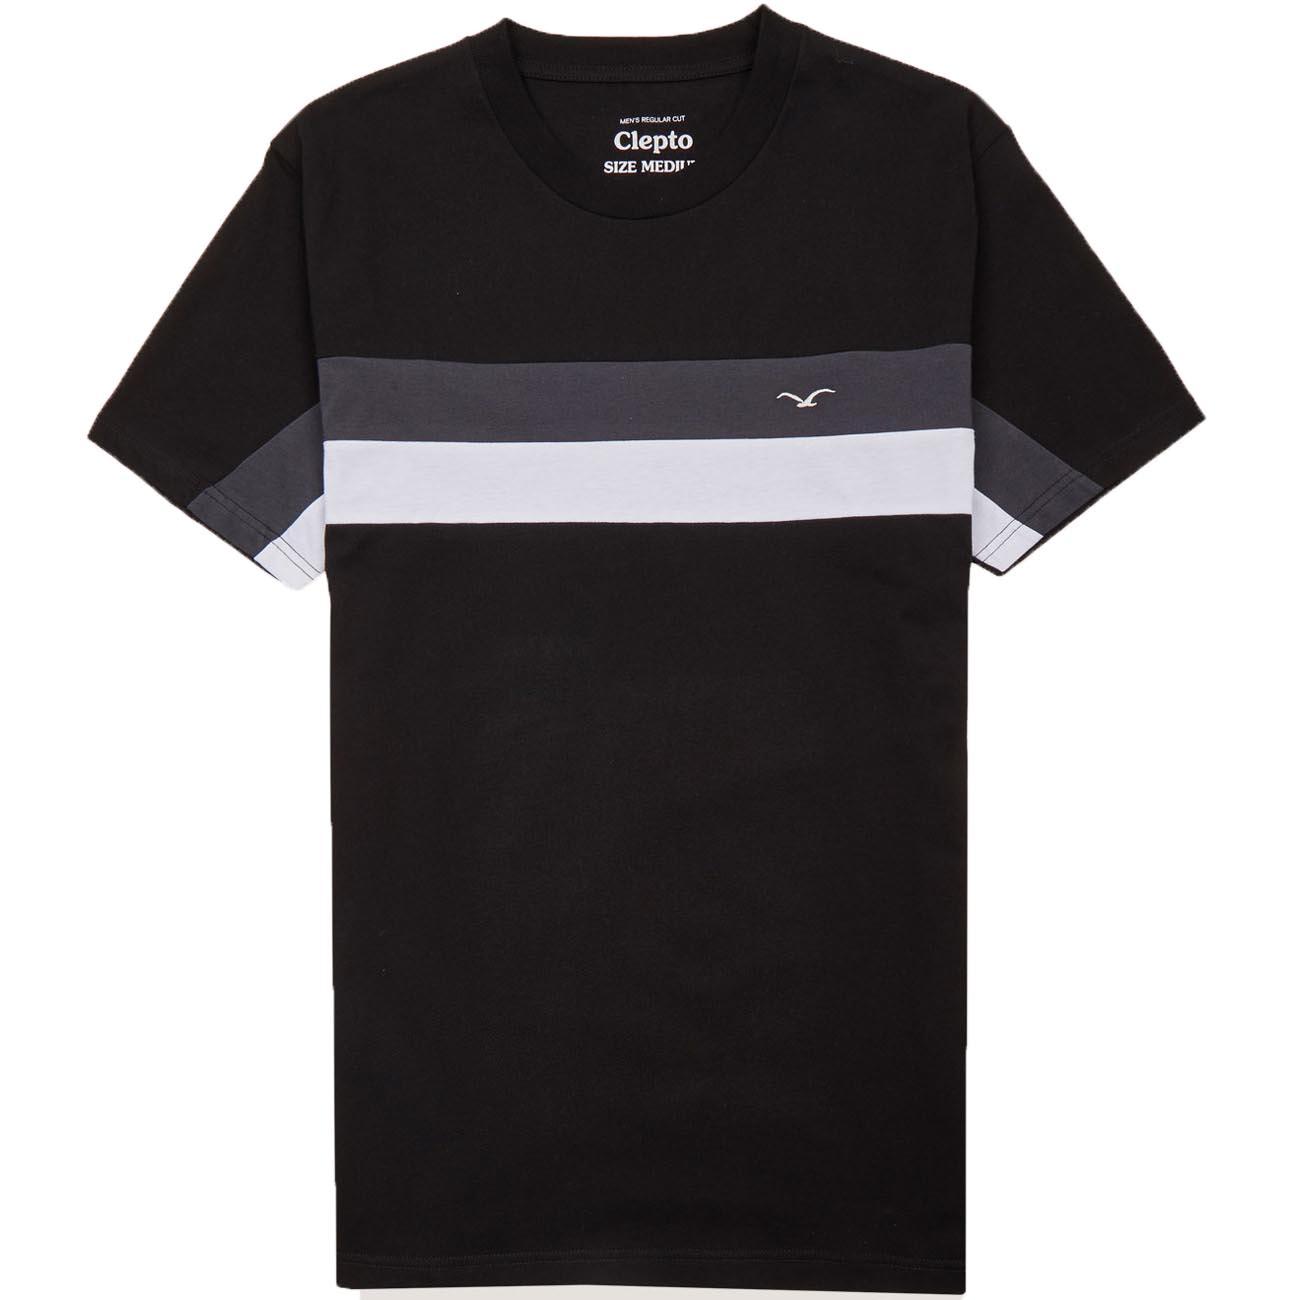 Cleptomanicx Herren T-Shirt Faster